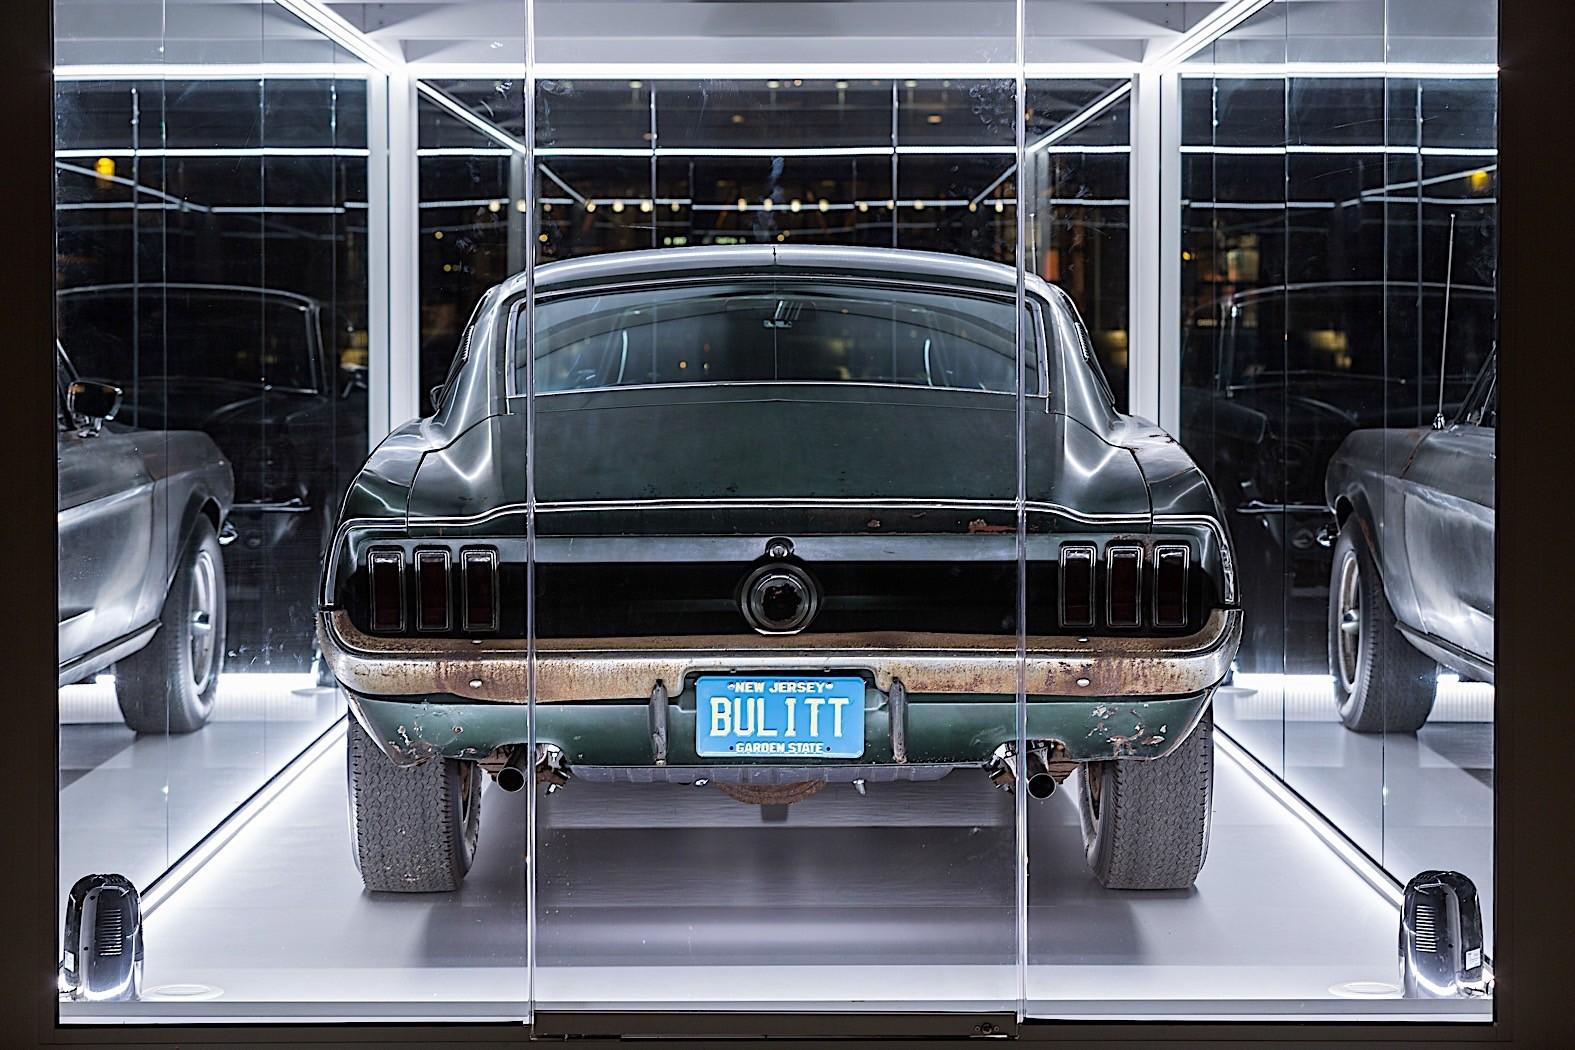 Original 1968 Bullitt Mustang to Be Shown in Washington - autoevolution